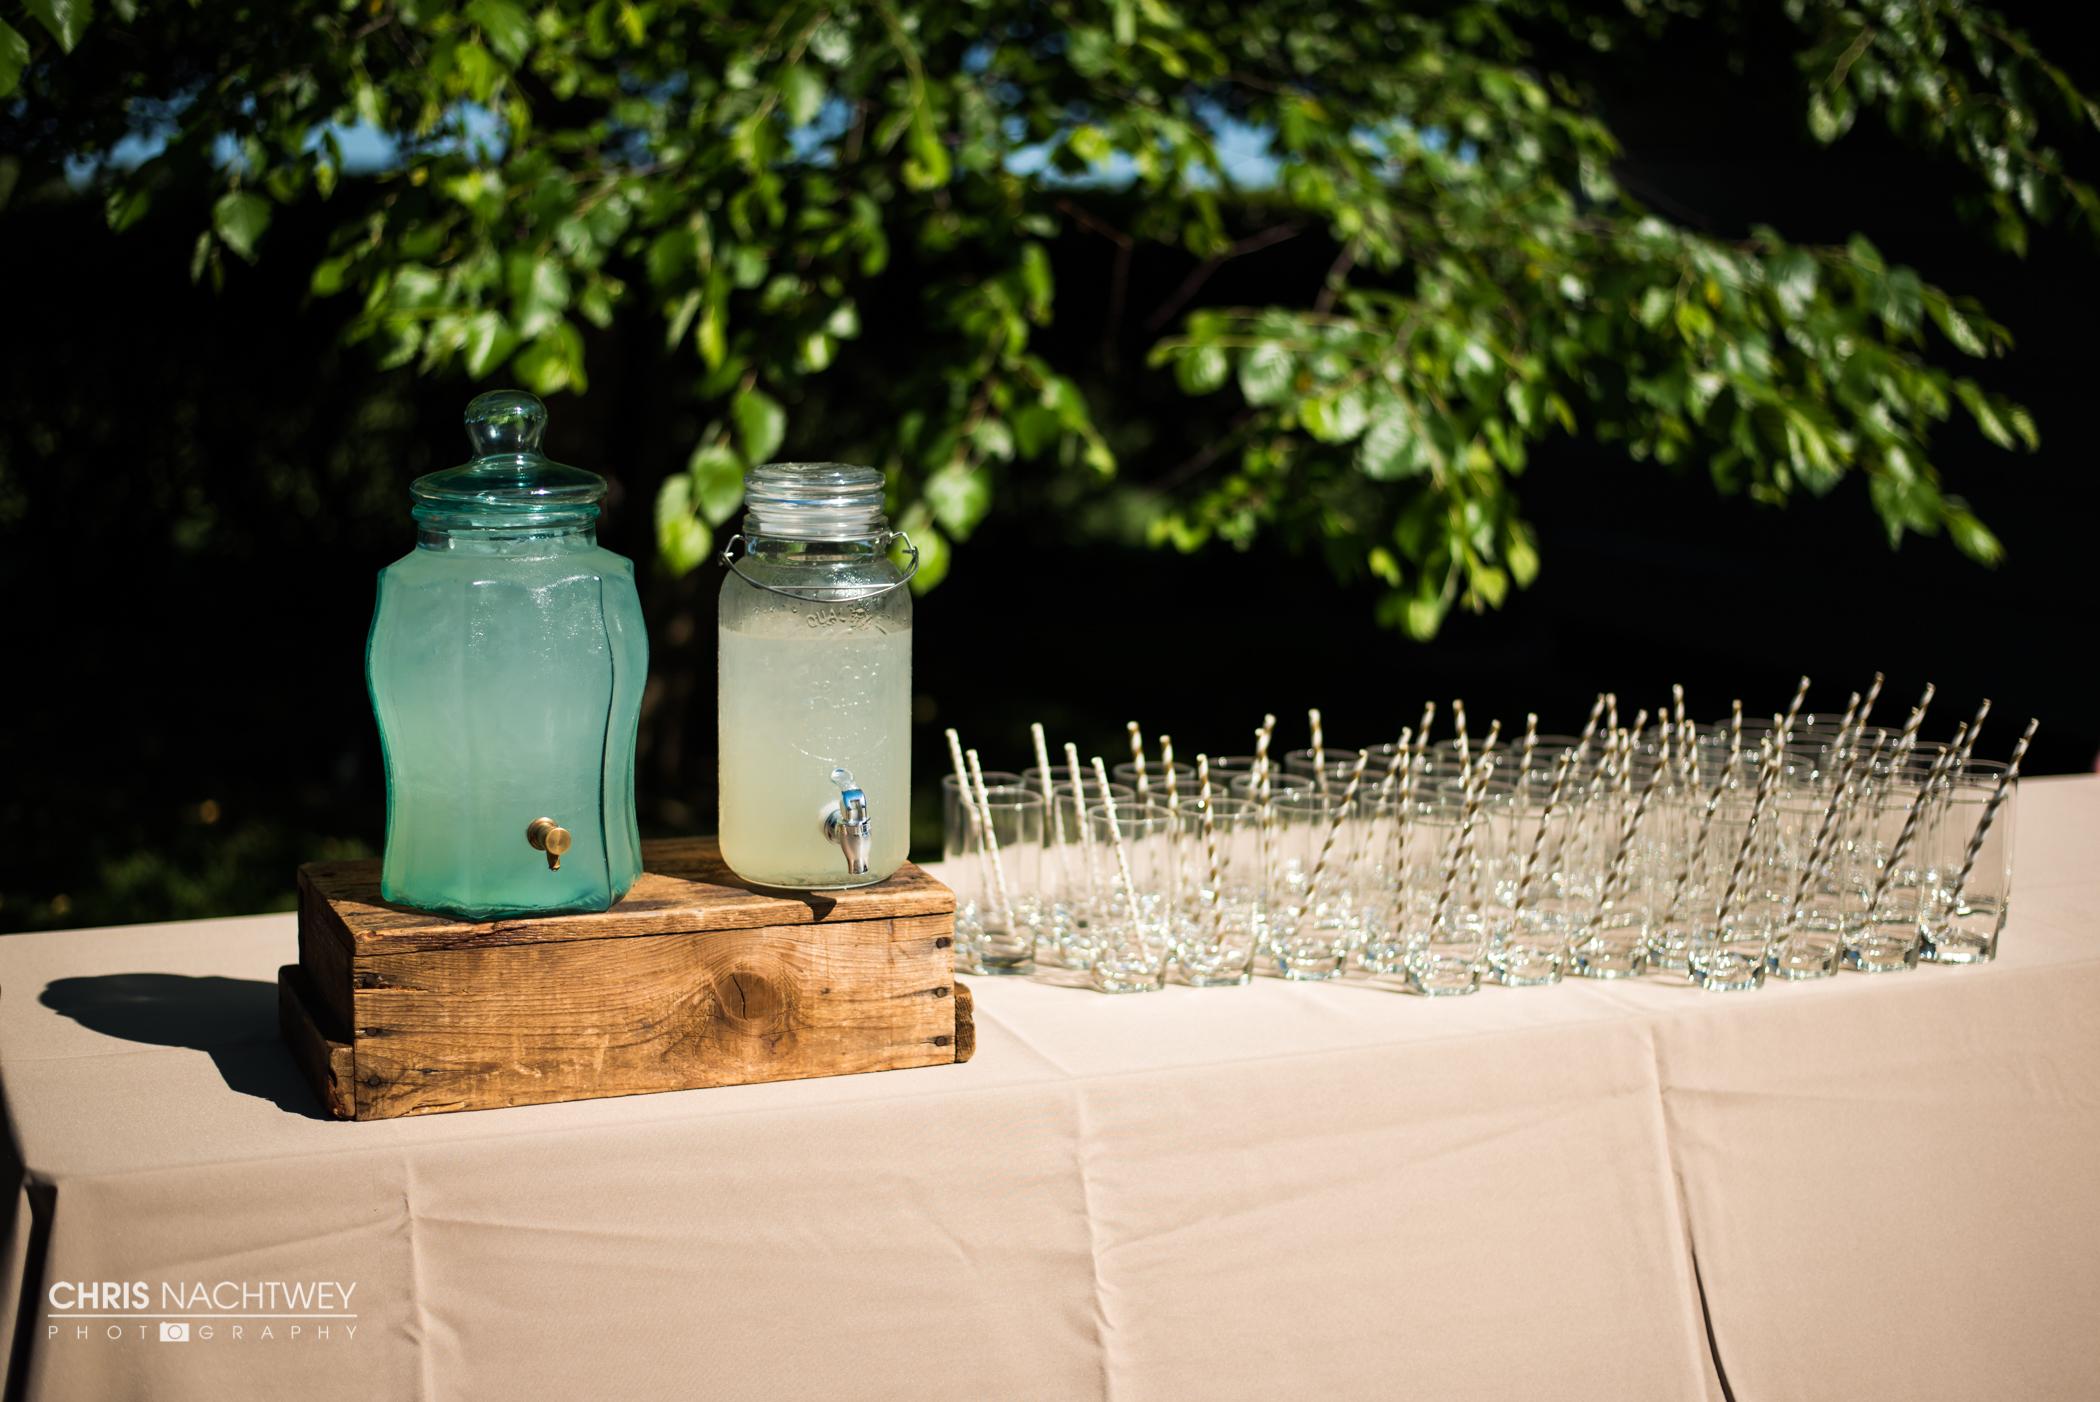 saltwater-farm-vineyard-wedding-photos-lindsay-gabe-chris-nachtwey-photography-2017-26.jpg